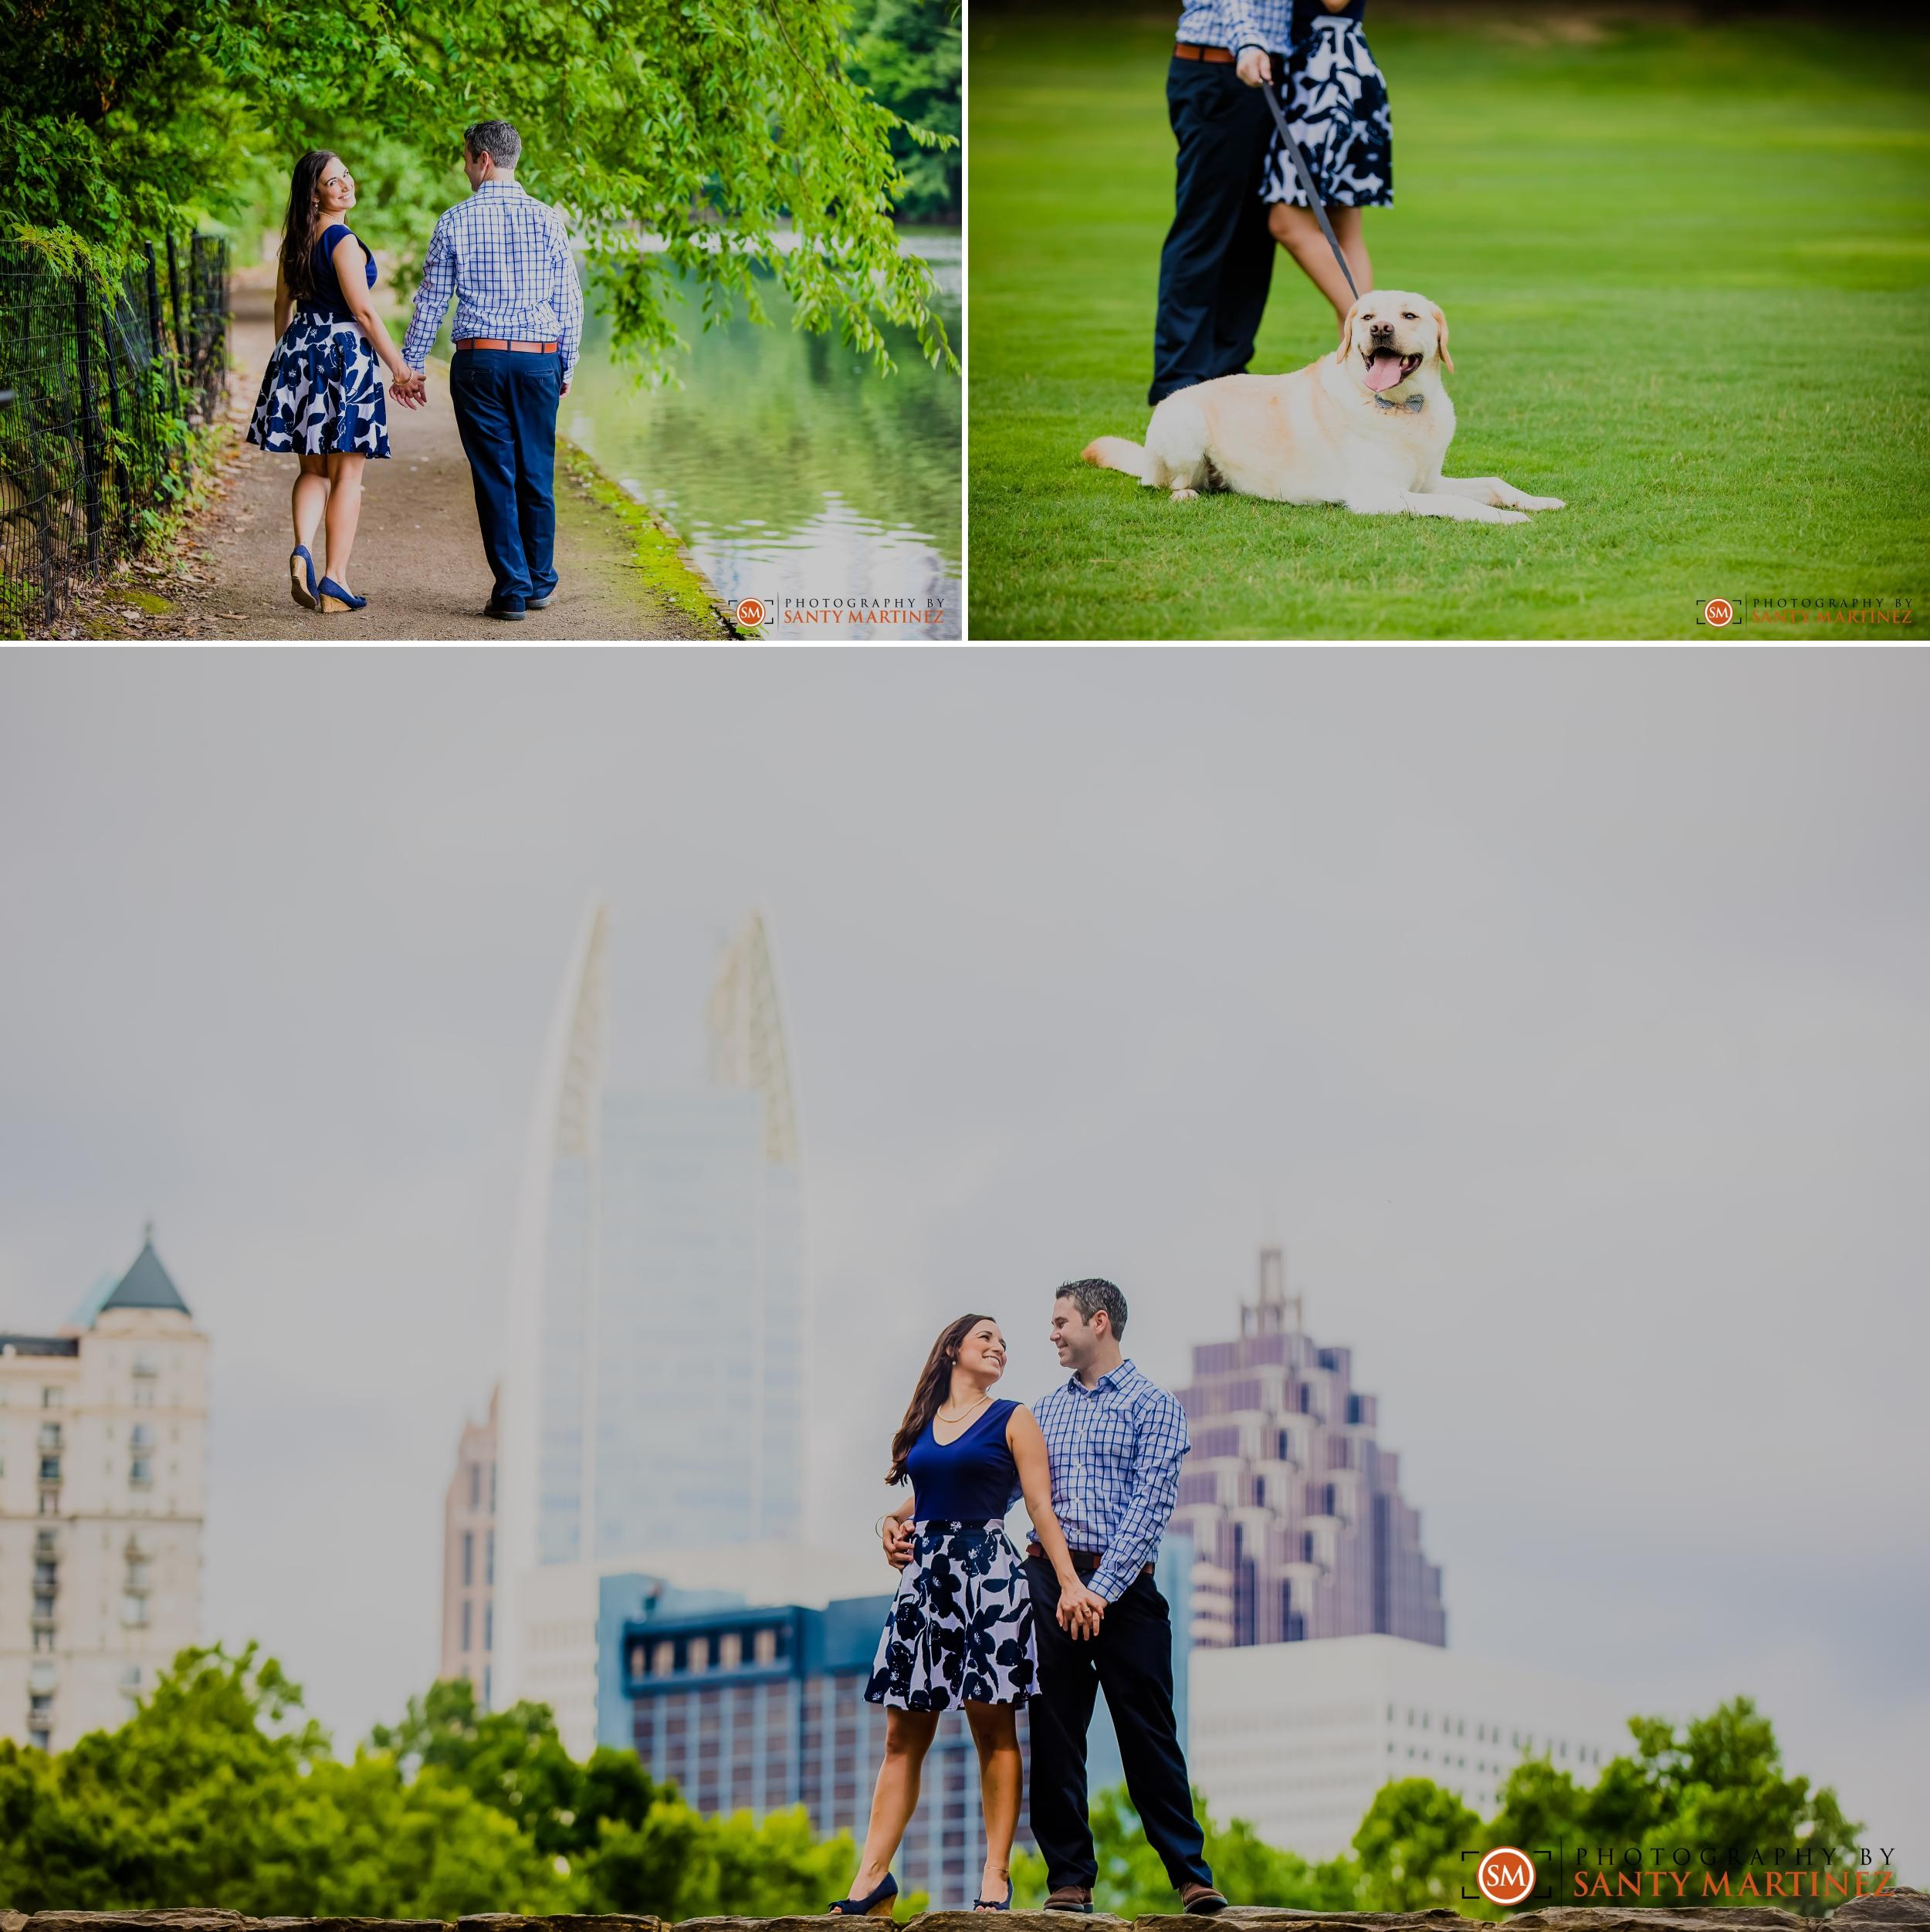 Engagement Session Piedmont Park - Santy Martinez Photography 5.jpg